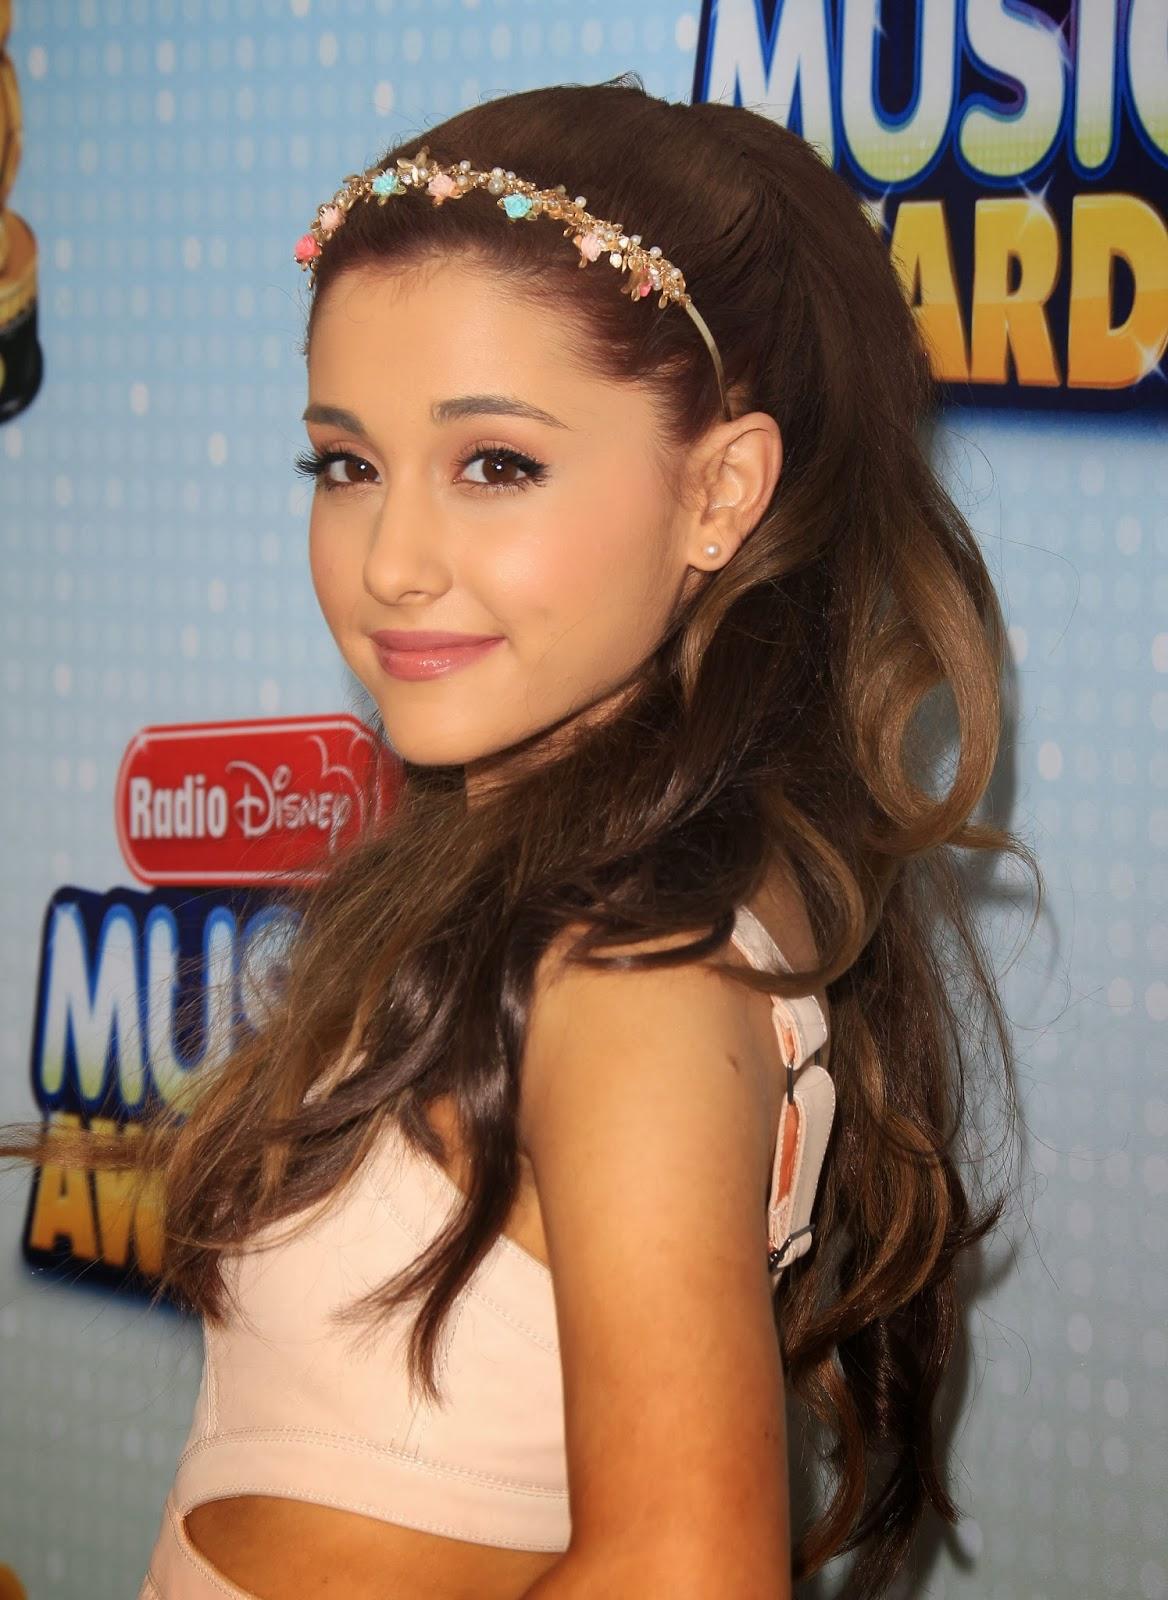 Magazine 4 Teens Looks Ariana Grande 1168x1600